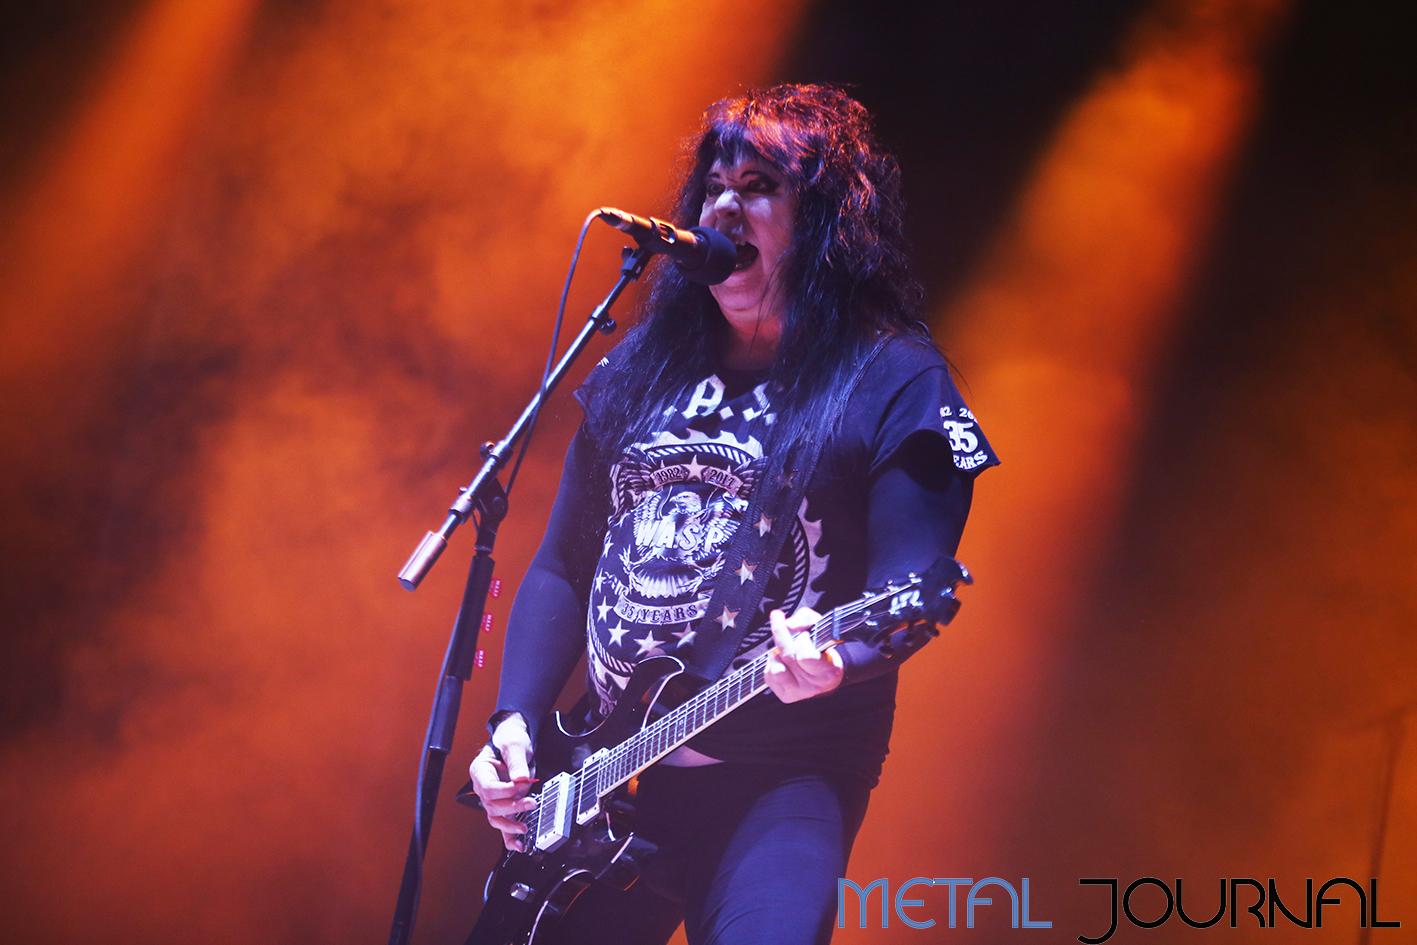 wasp - metal journal rock fest barcelona 2019 pic 5